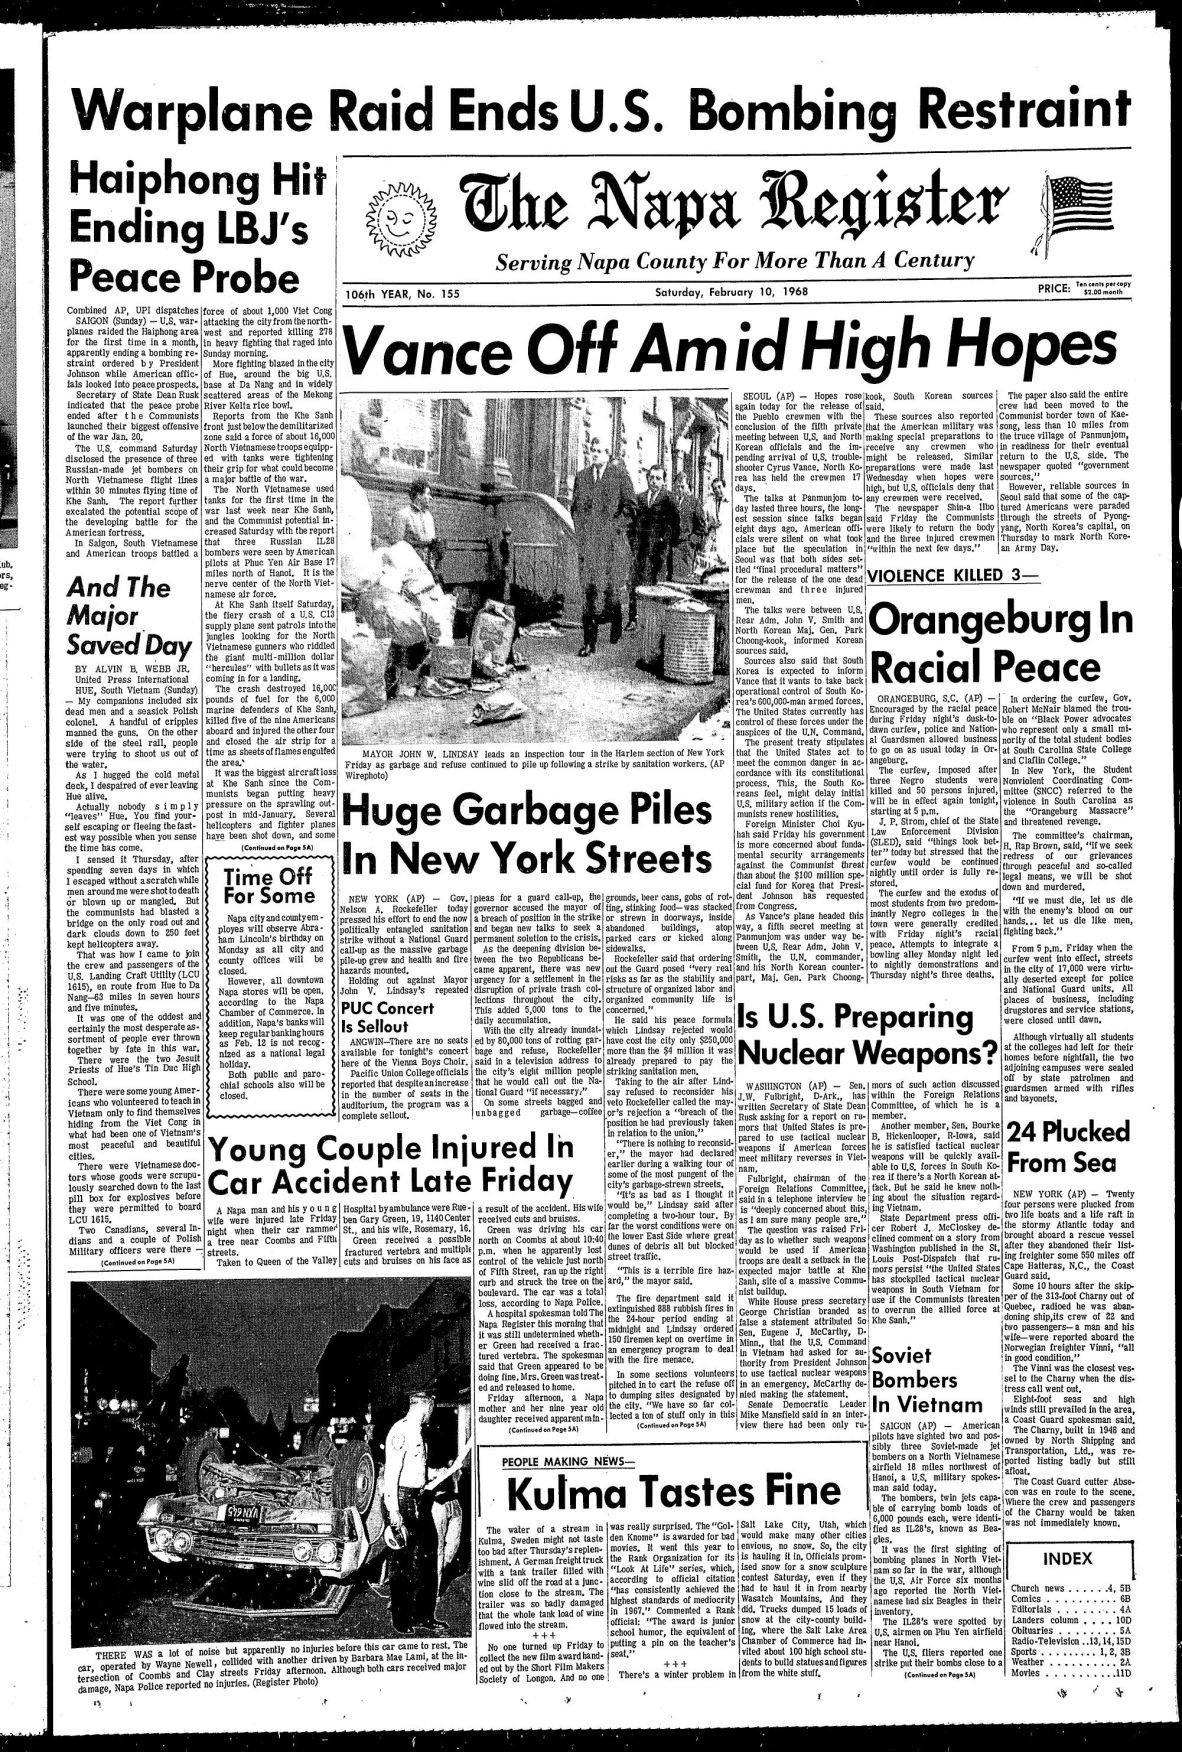 Feb. 10, 1968